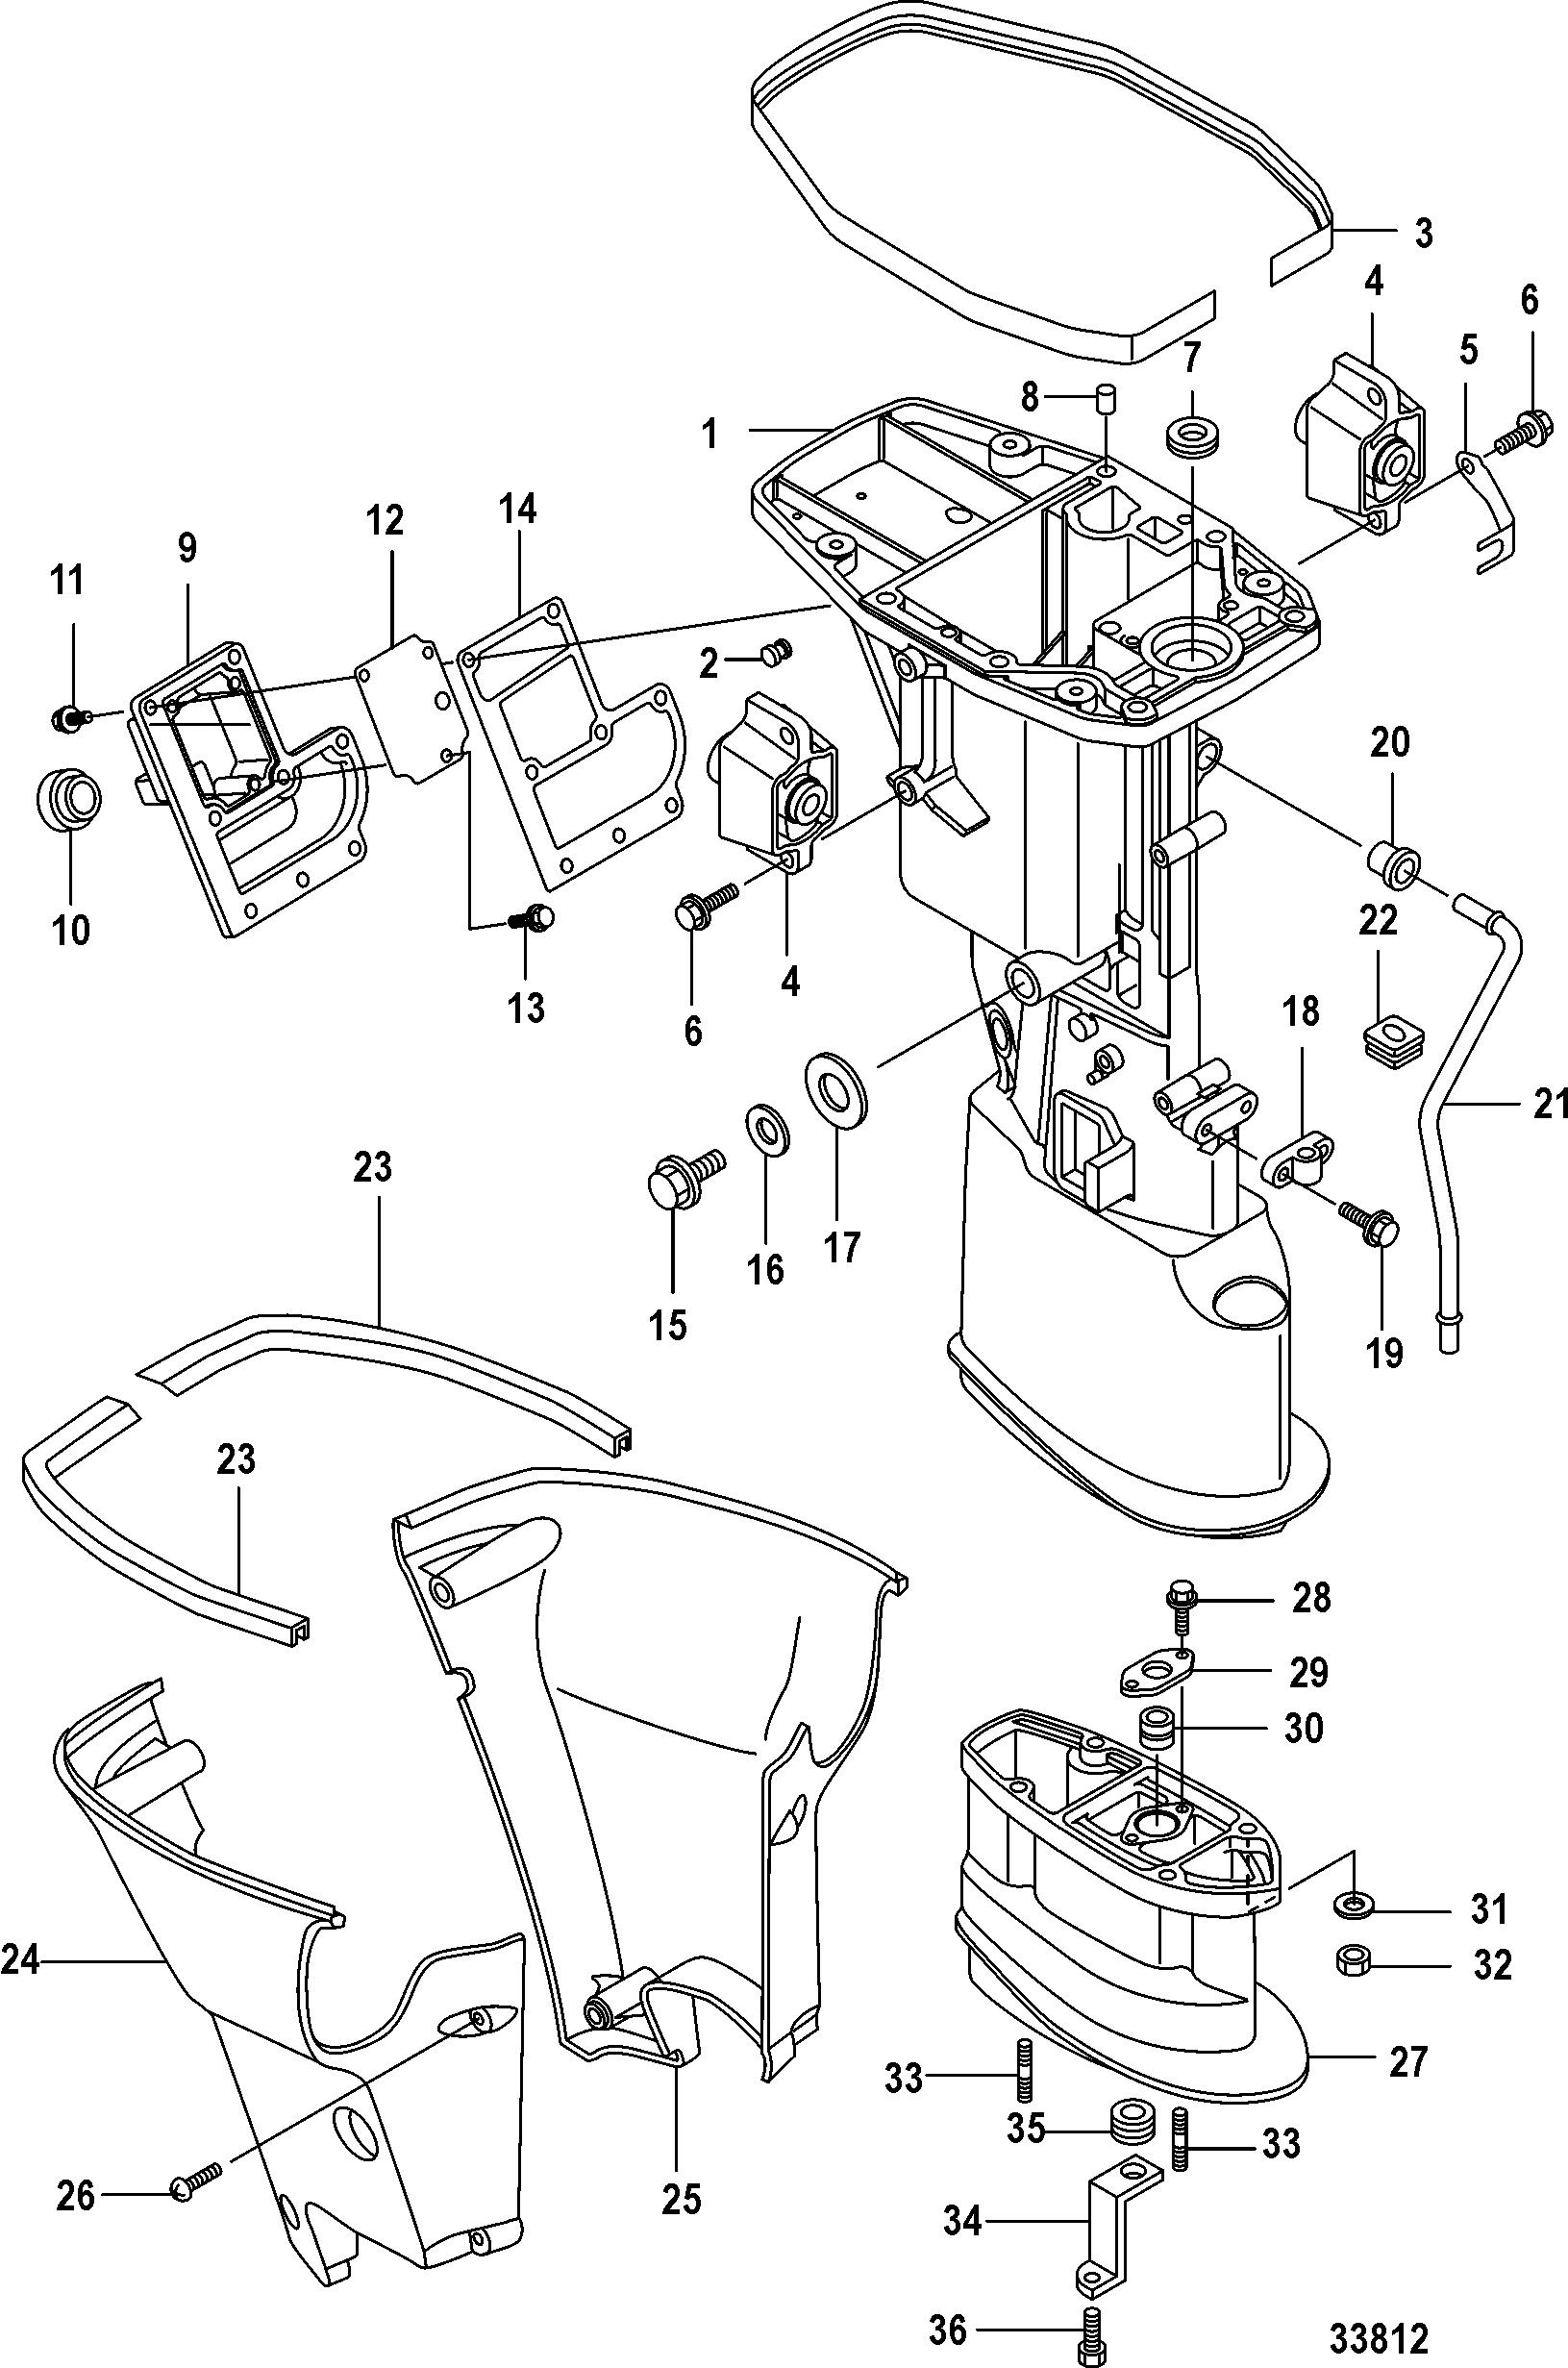 Каталог запчастей MARINER 15 Carb(2CYL)(4-STROKE) 0R235949